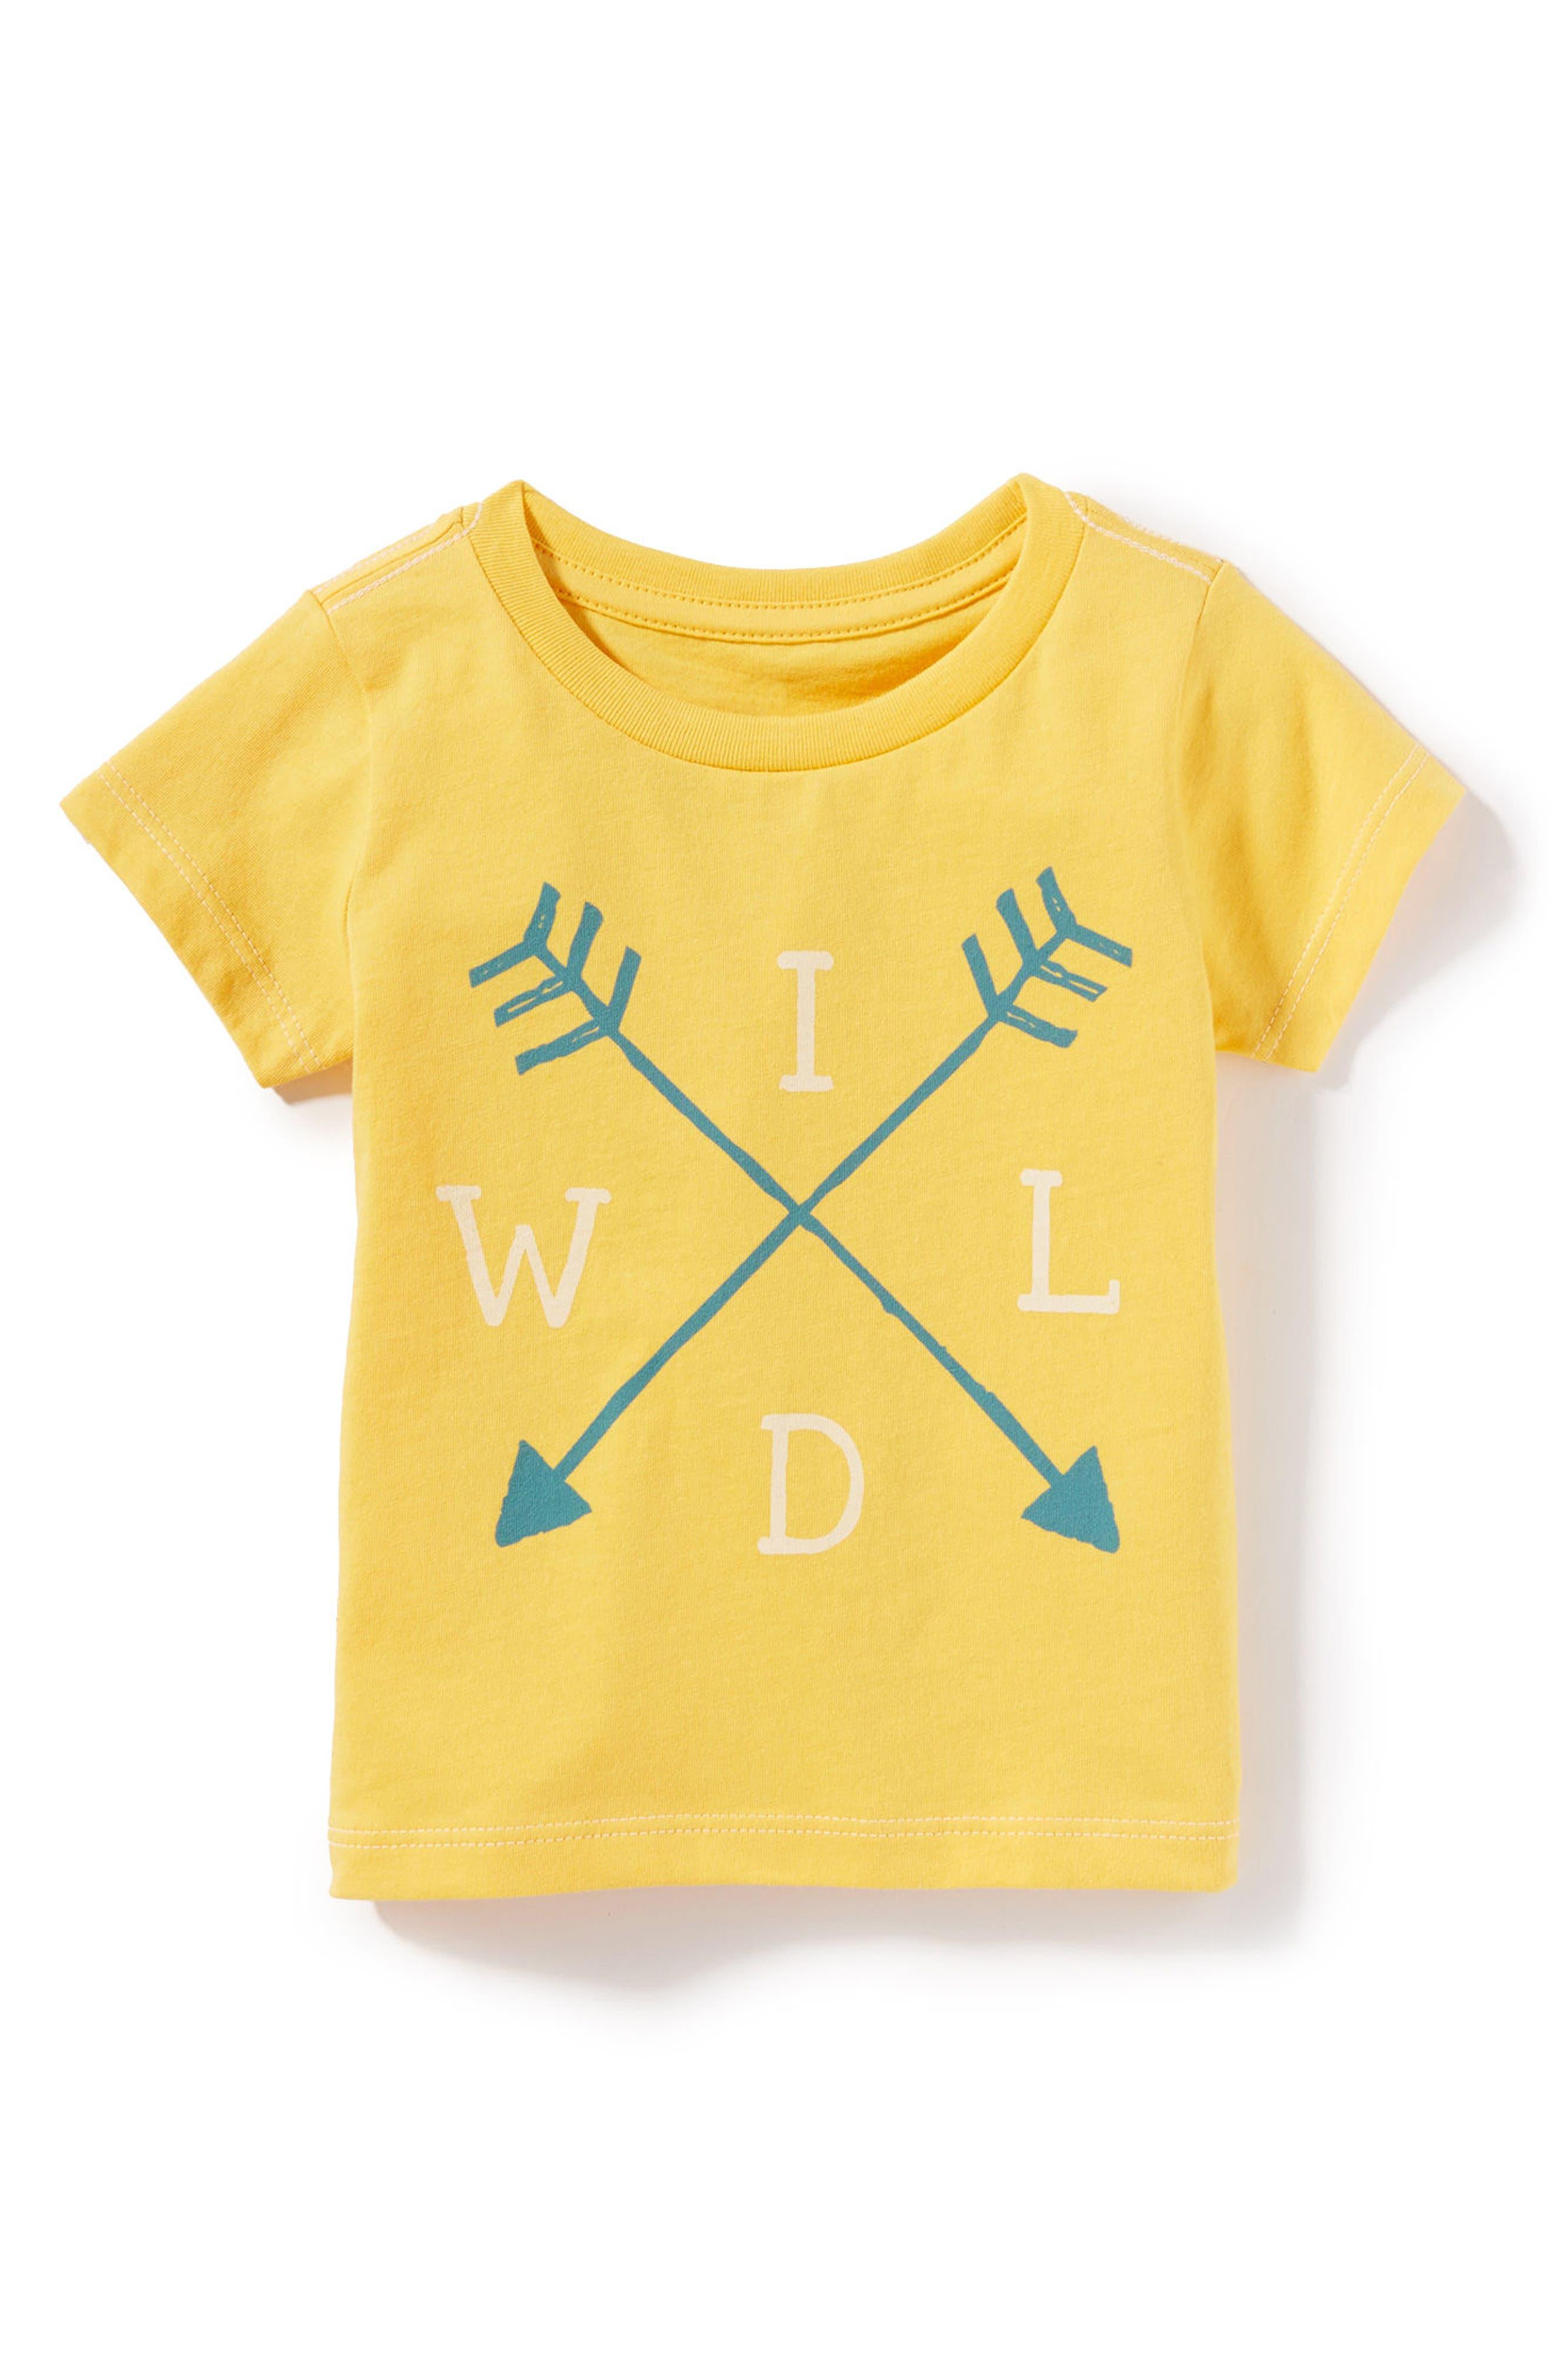 Alternate Image 1 Selected - Peek Wild Graphic T-Shirt (Baby Boys)